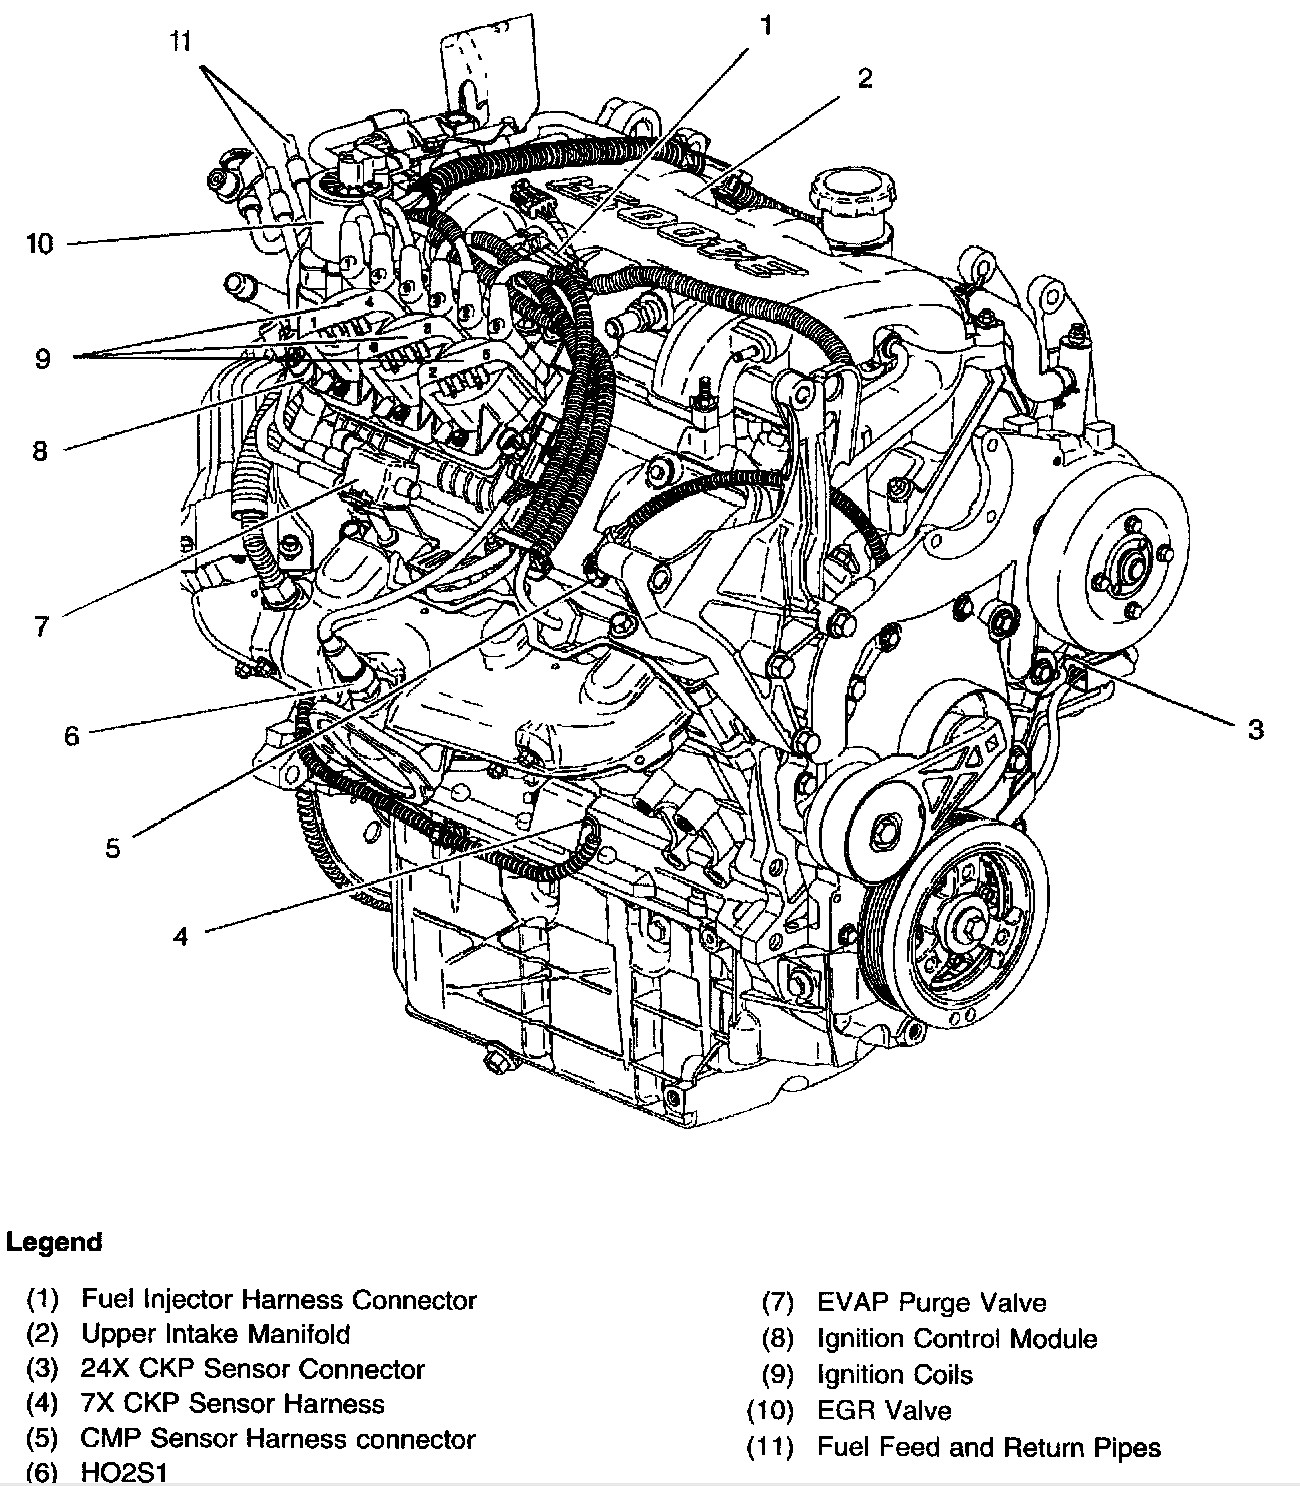 2003 chevy impala engine diagram wiring diagram user 2002 chevy impala starting problems 2002 chevy impala engine diagram #14